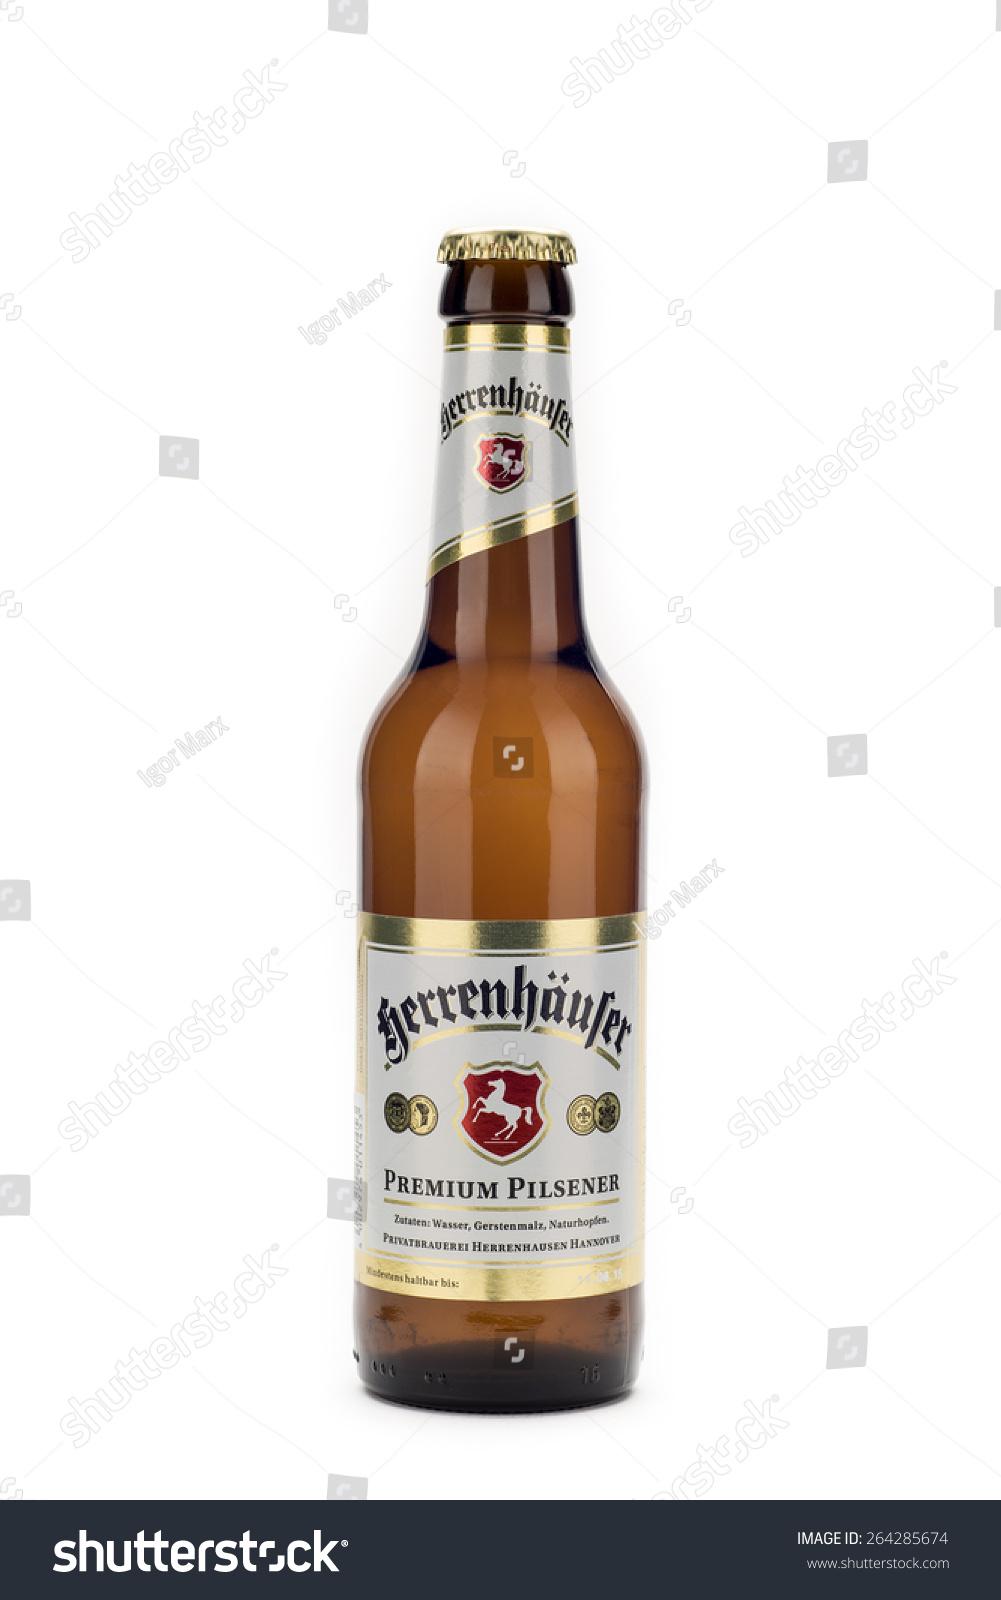 Hannover germany march 27 2015 bottle of herrenhauser premium pilsener beer